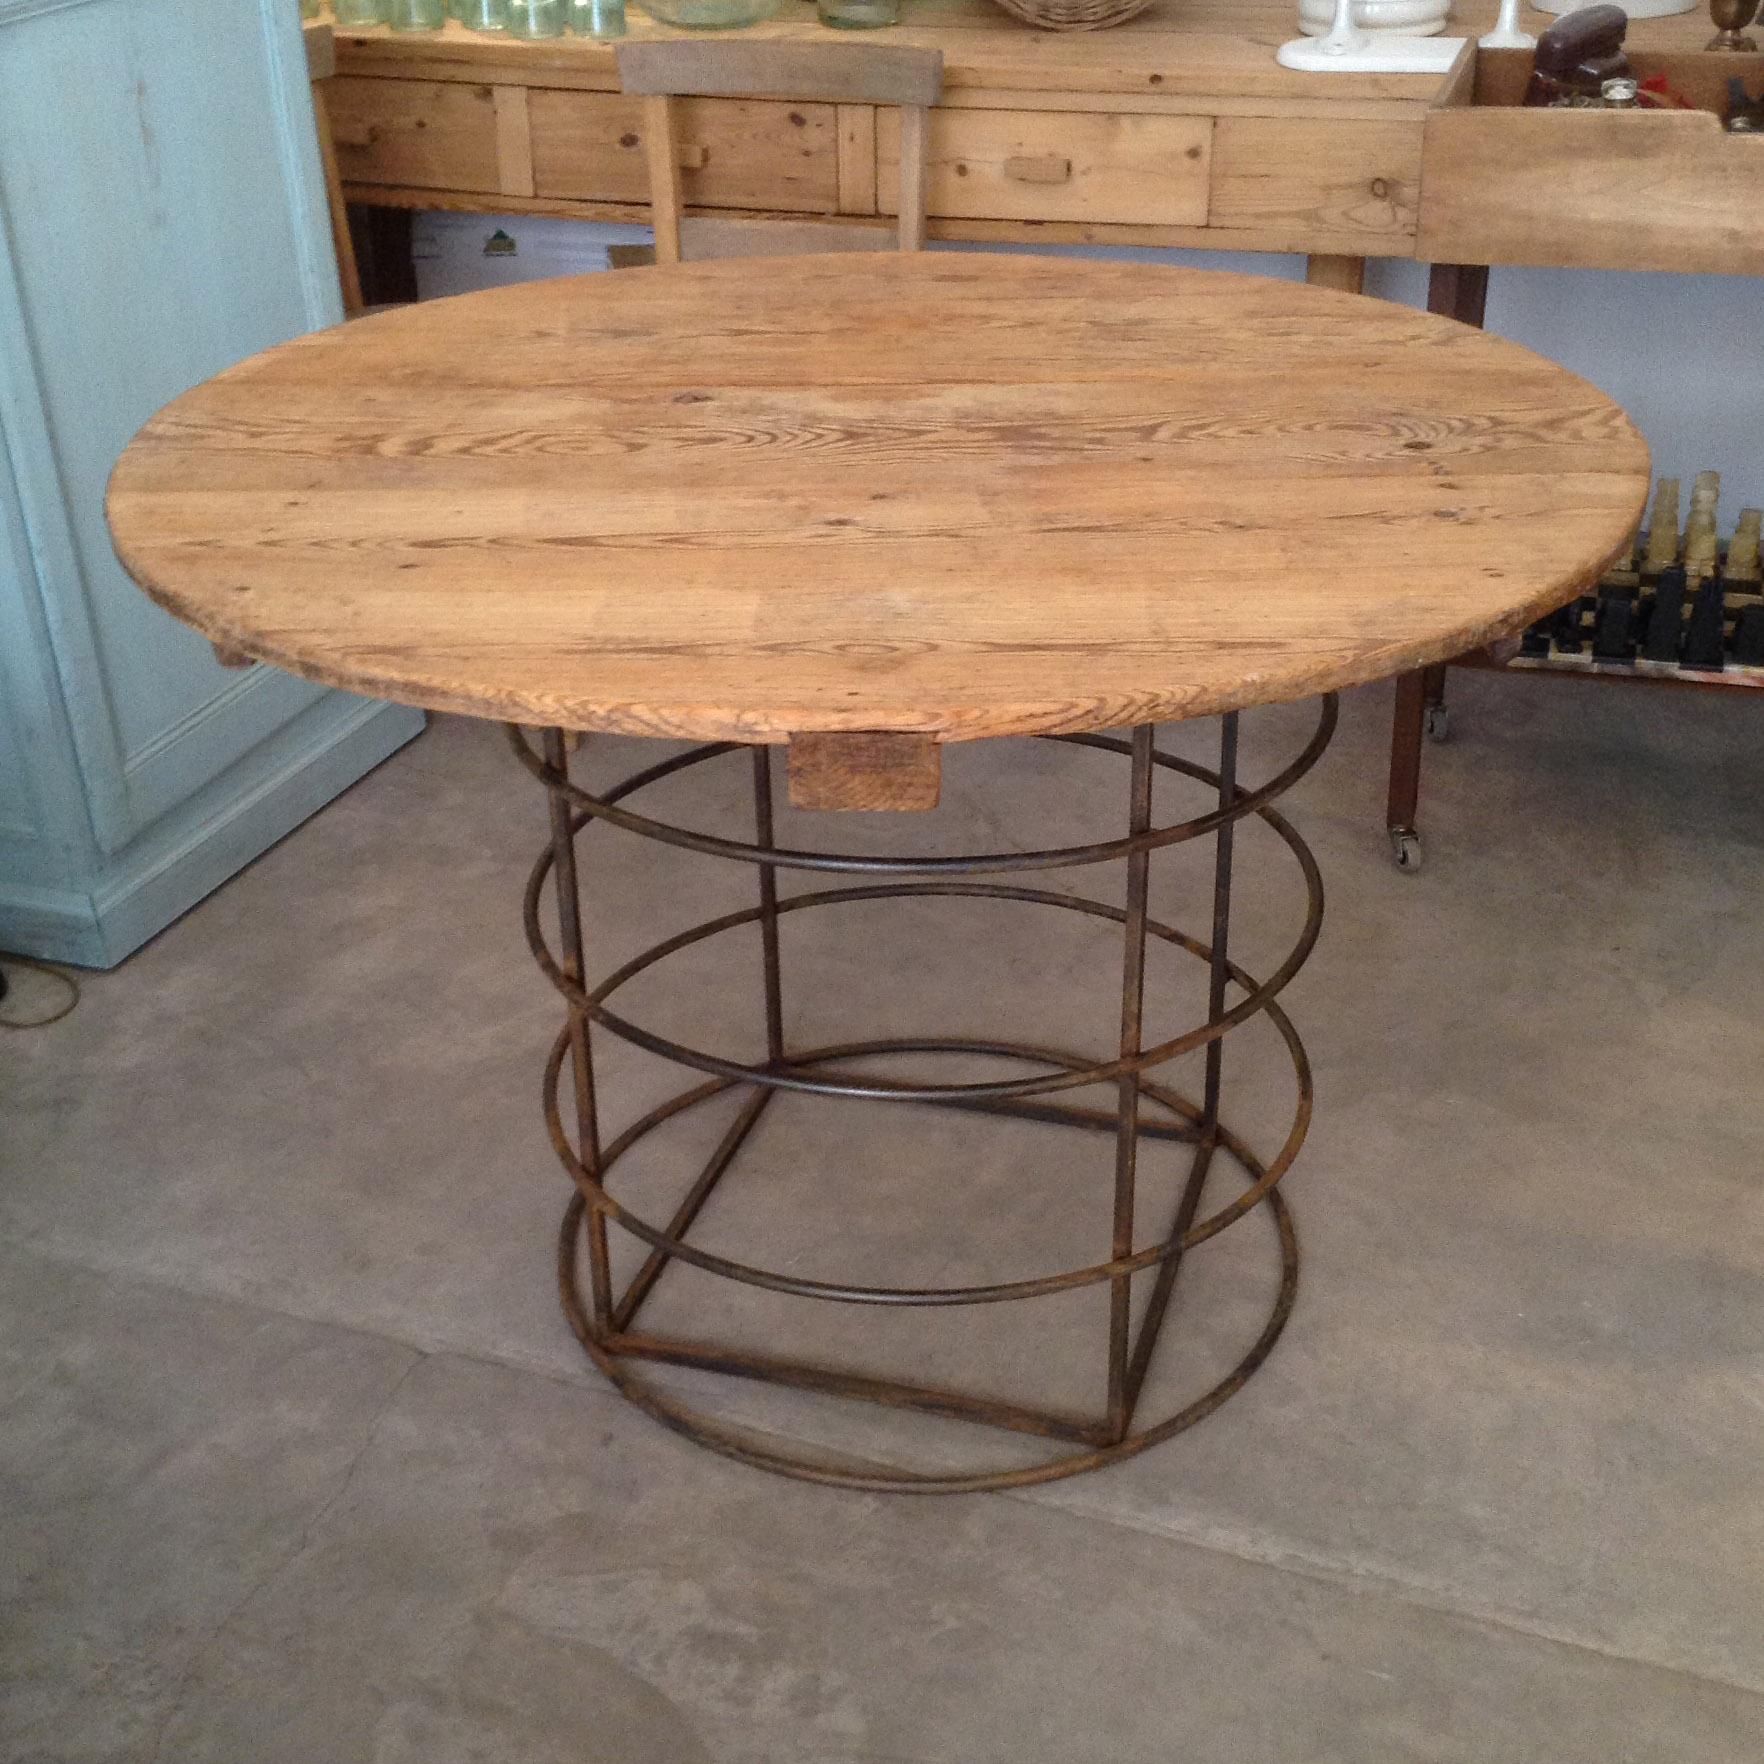 mesa redonda estructura hierro tablero madera pino a medida decoracion madrid toledo